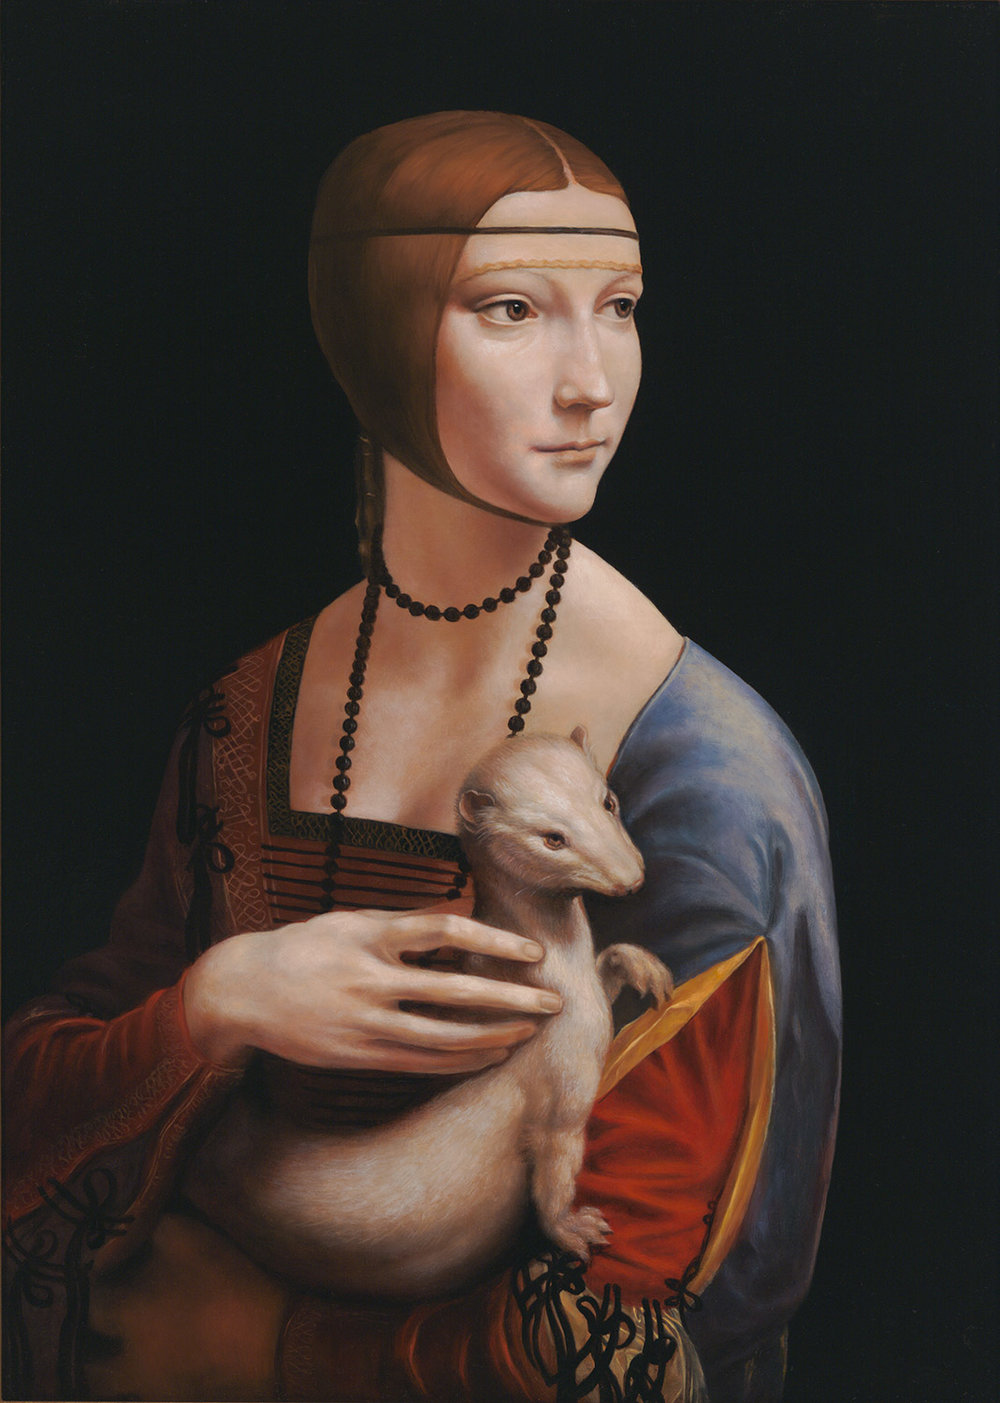 Master Copy of Leonardo da Vinci's Lady with an Ermine